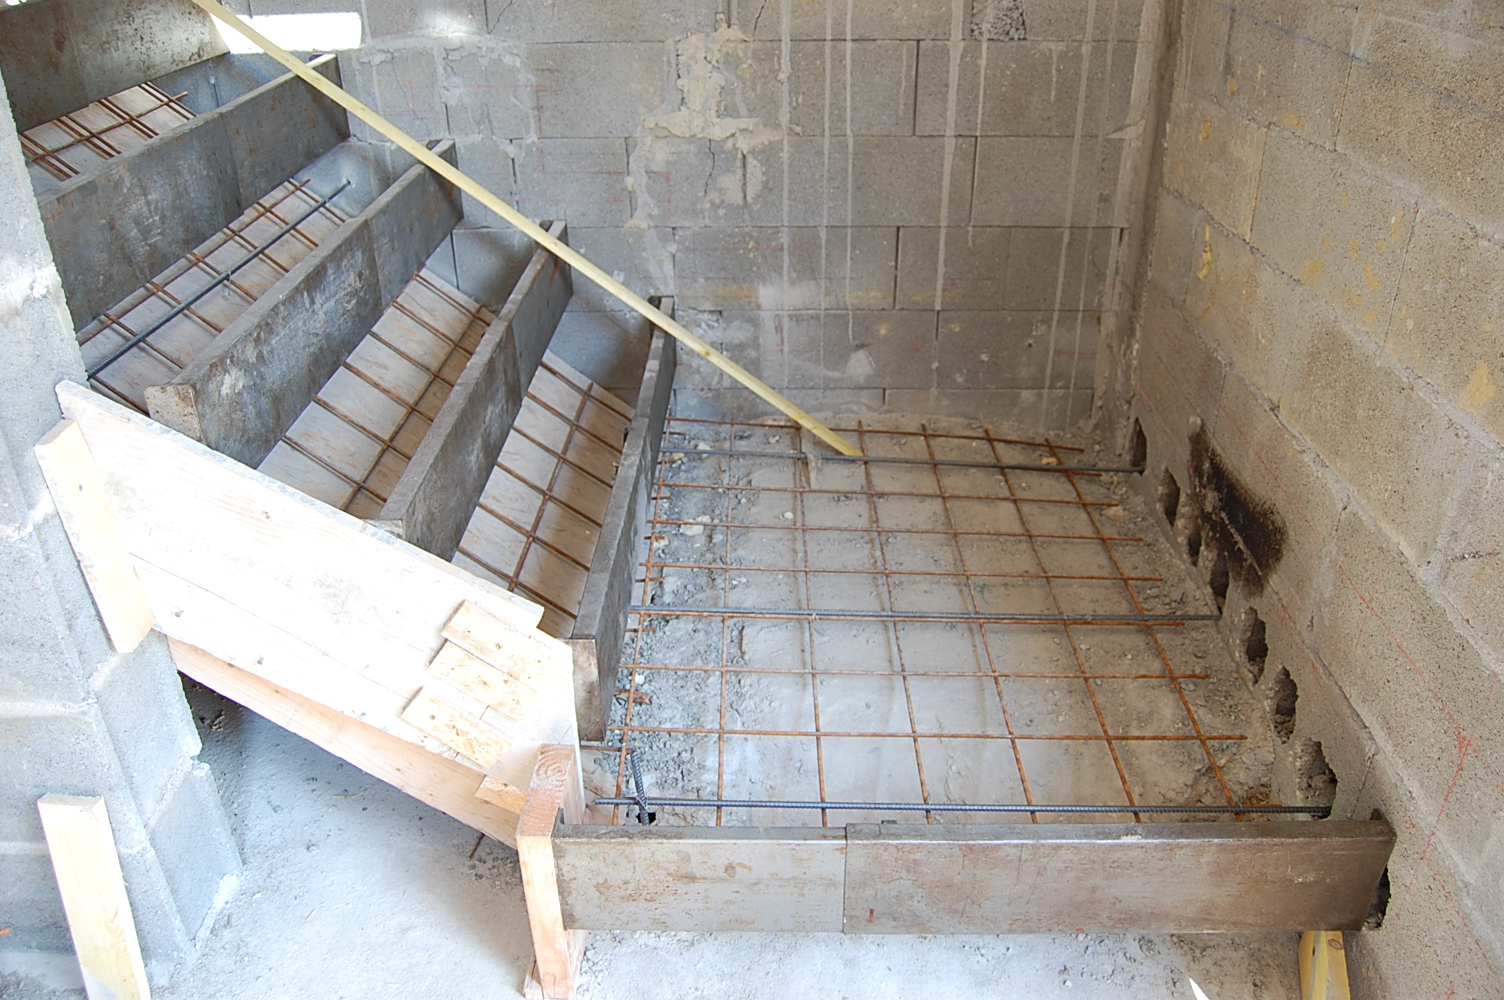 pin coffrage escalier on pinterest. Black Bedroom Furniture Sets. Home Design Ideas